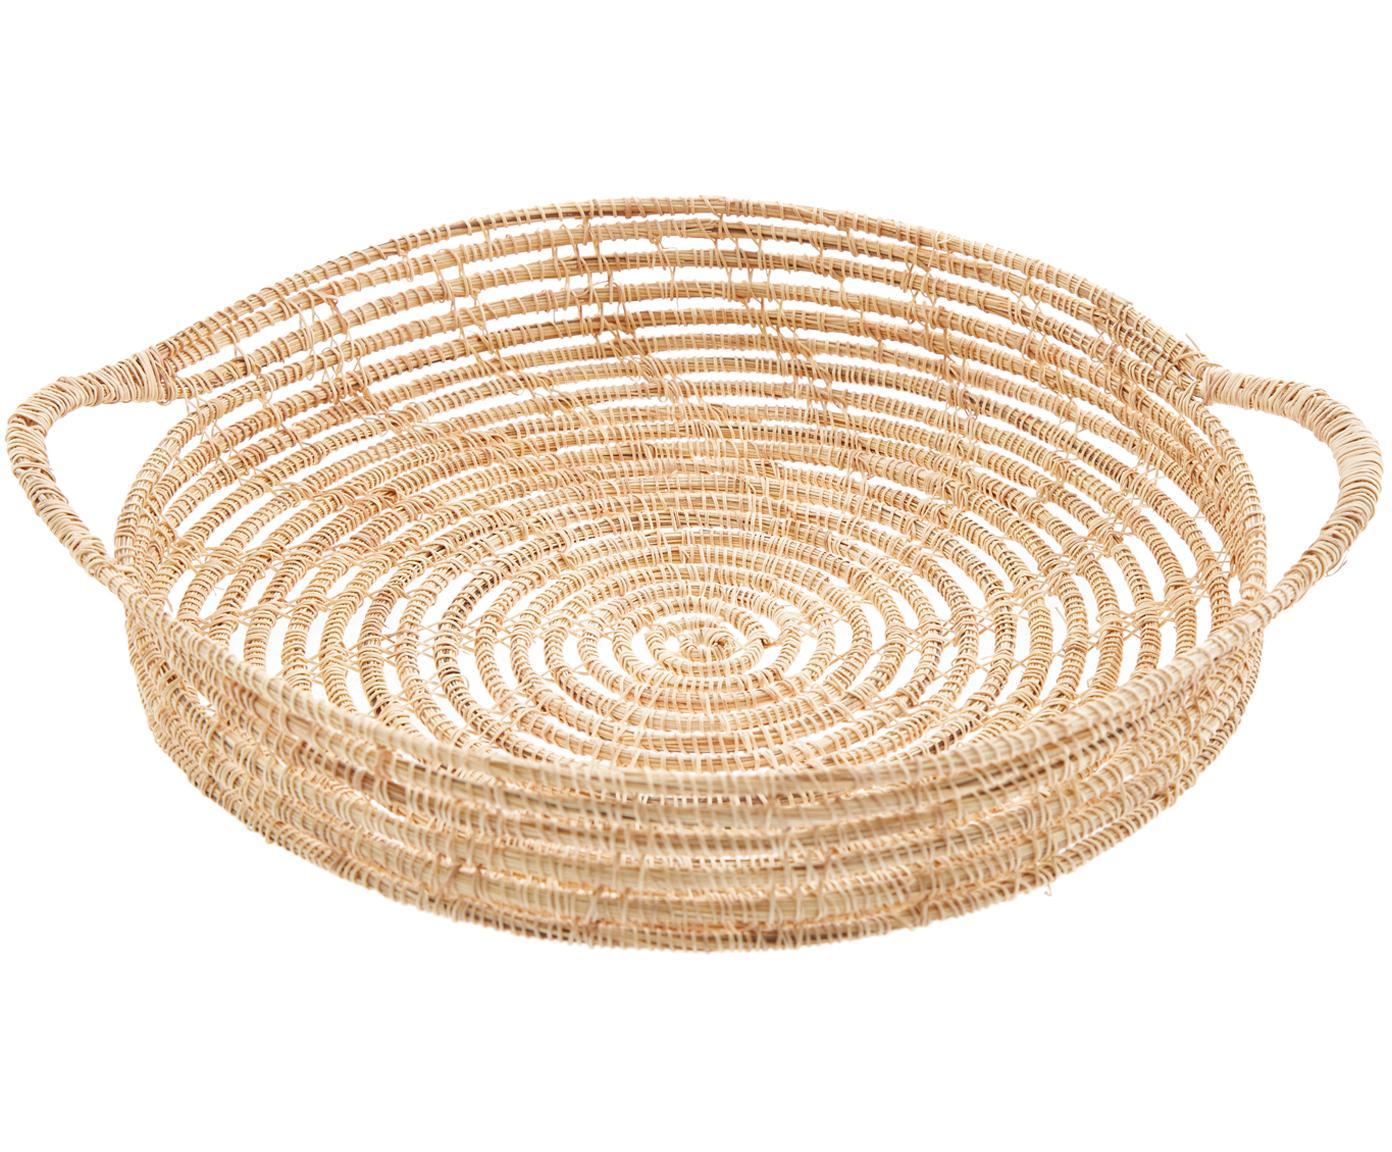 Vassoio in fibre di palma Emilia, Fibre di palma, Fibre di palma, Ø 30 cm